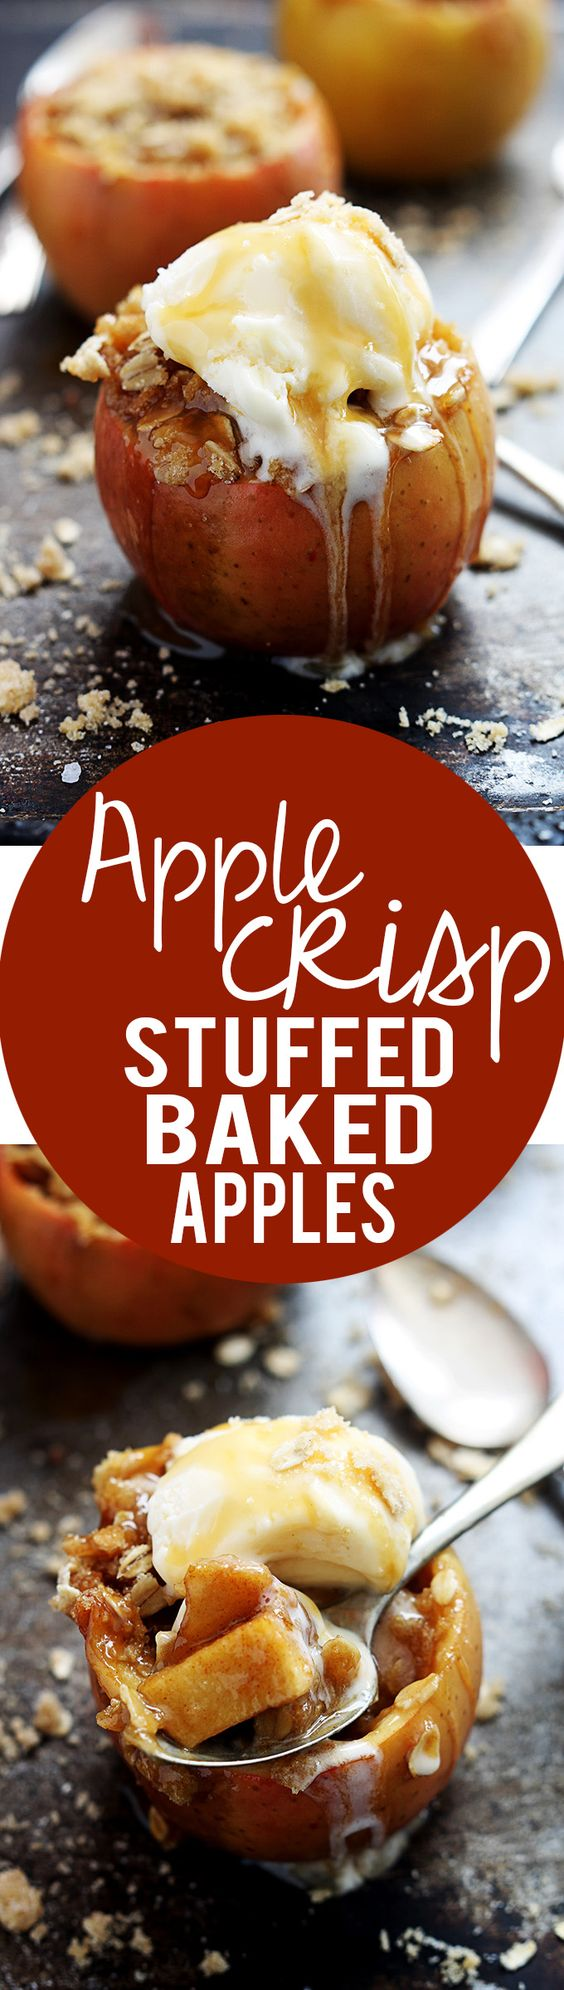 Apple Crisp Stuffed Baked Apples   Creme de la Crumb